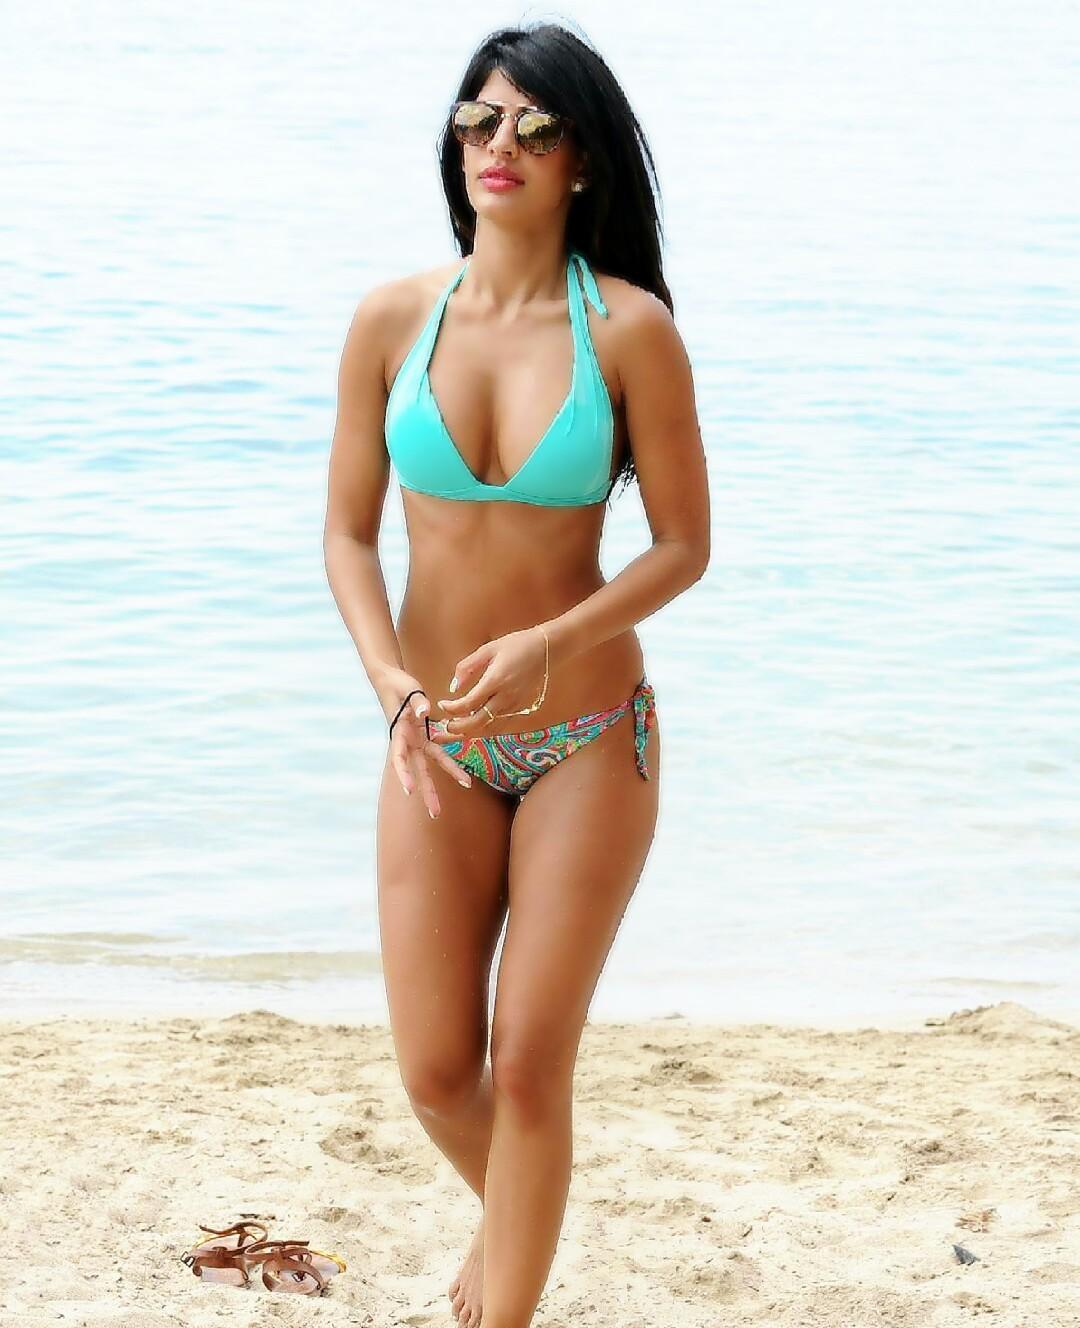 Jasmin Walia Hot Bikini Photoshoot Hd Photos